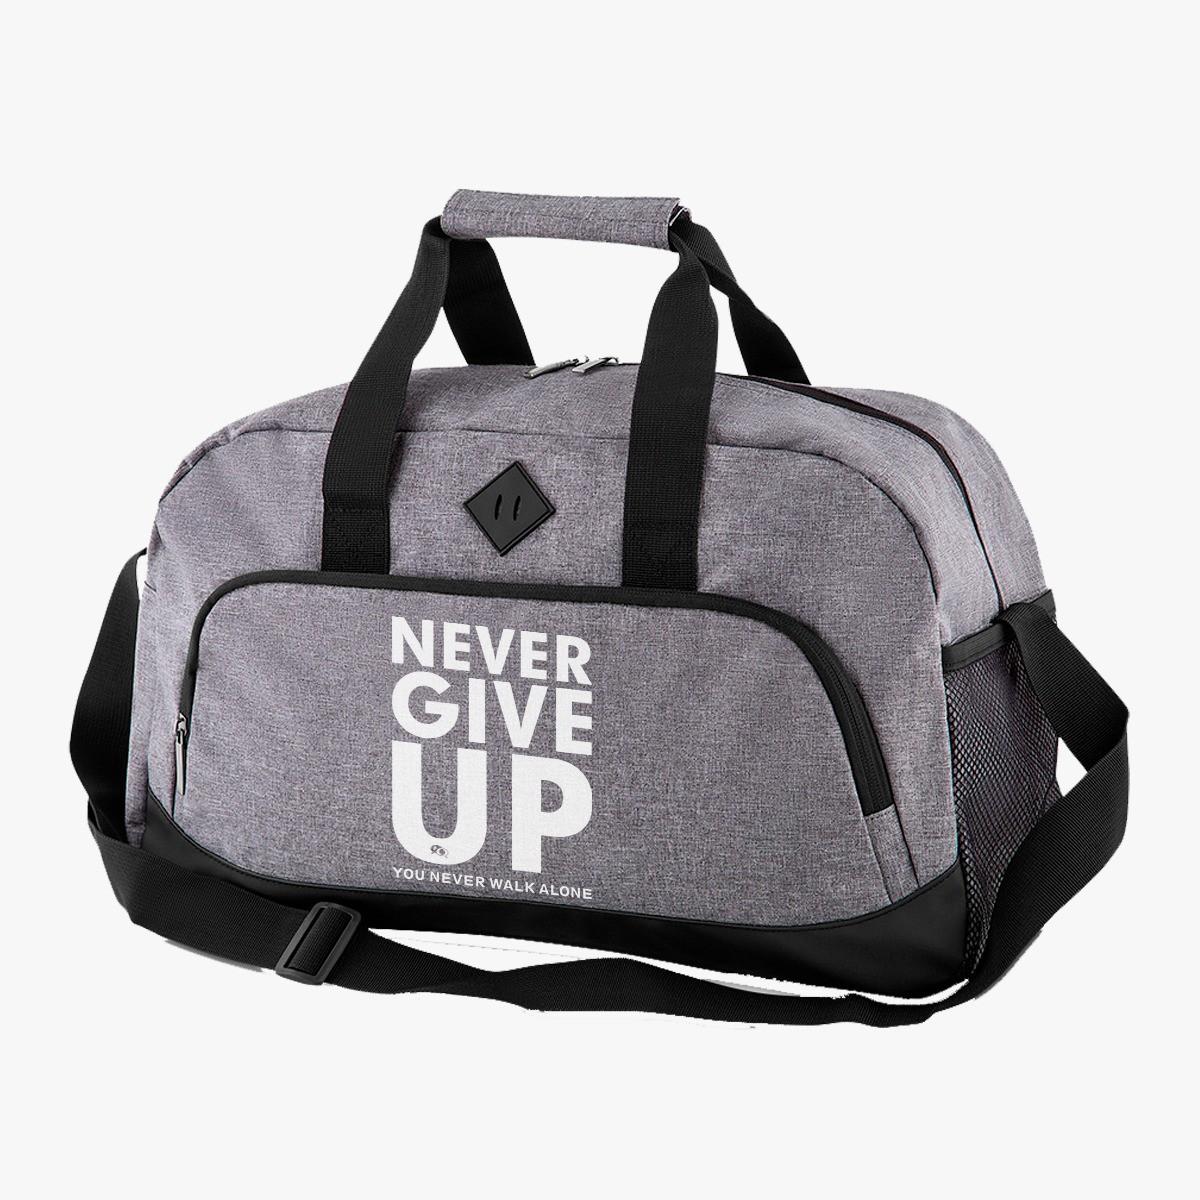 Mala Tranversal - NEVER GIVE UP